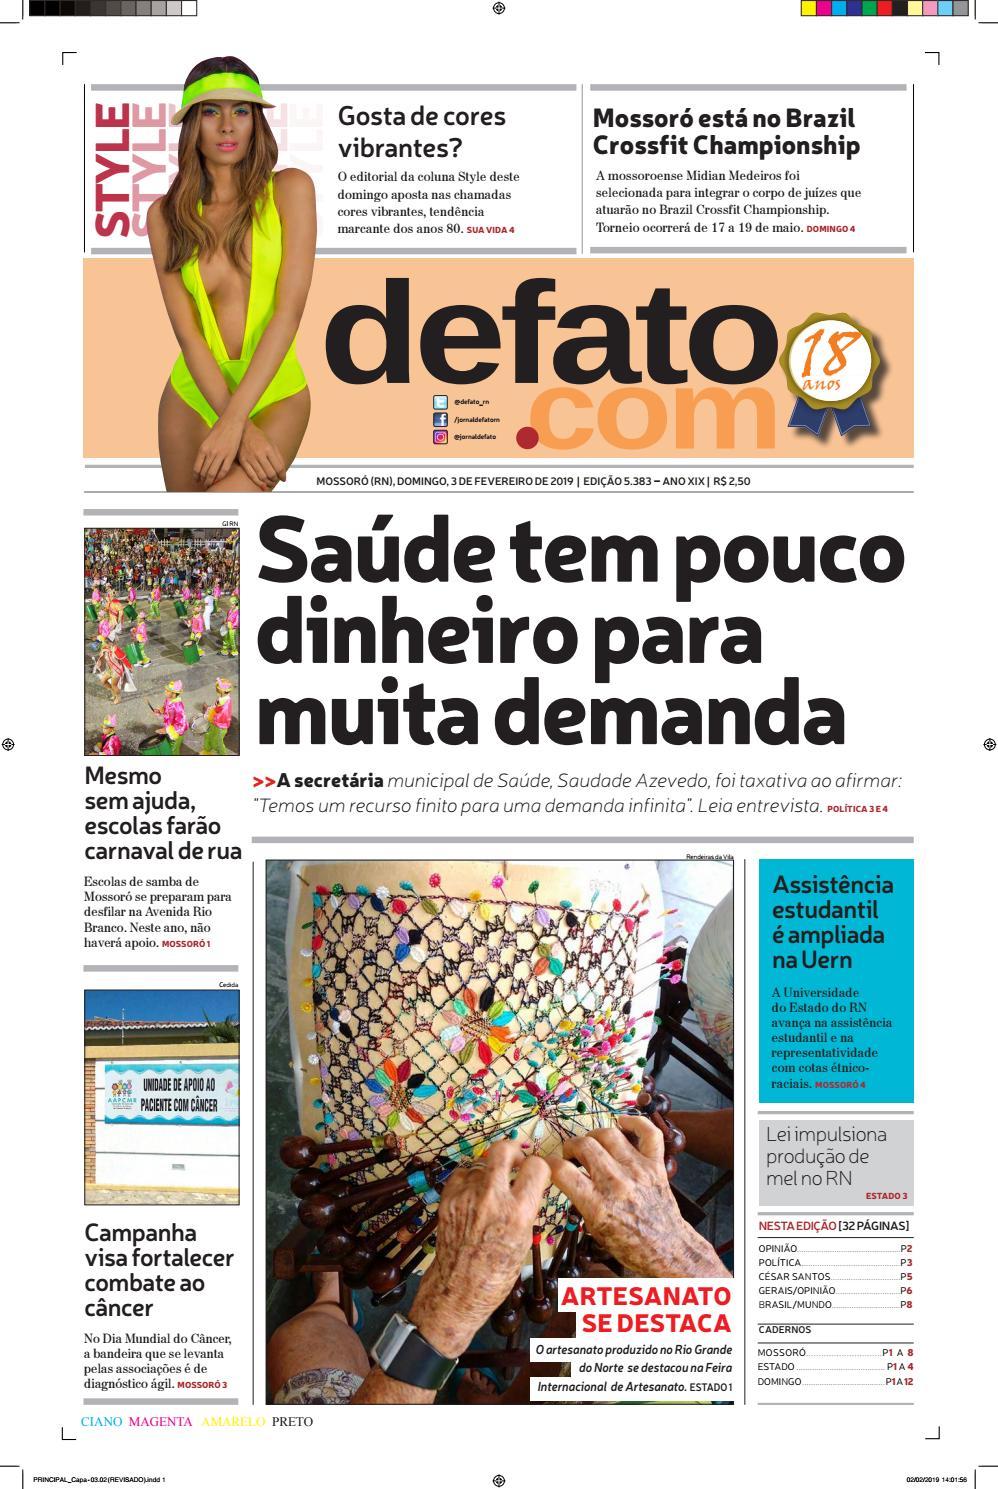 Jornal de Fato by Jornal de Fato - issuu 165d548a33